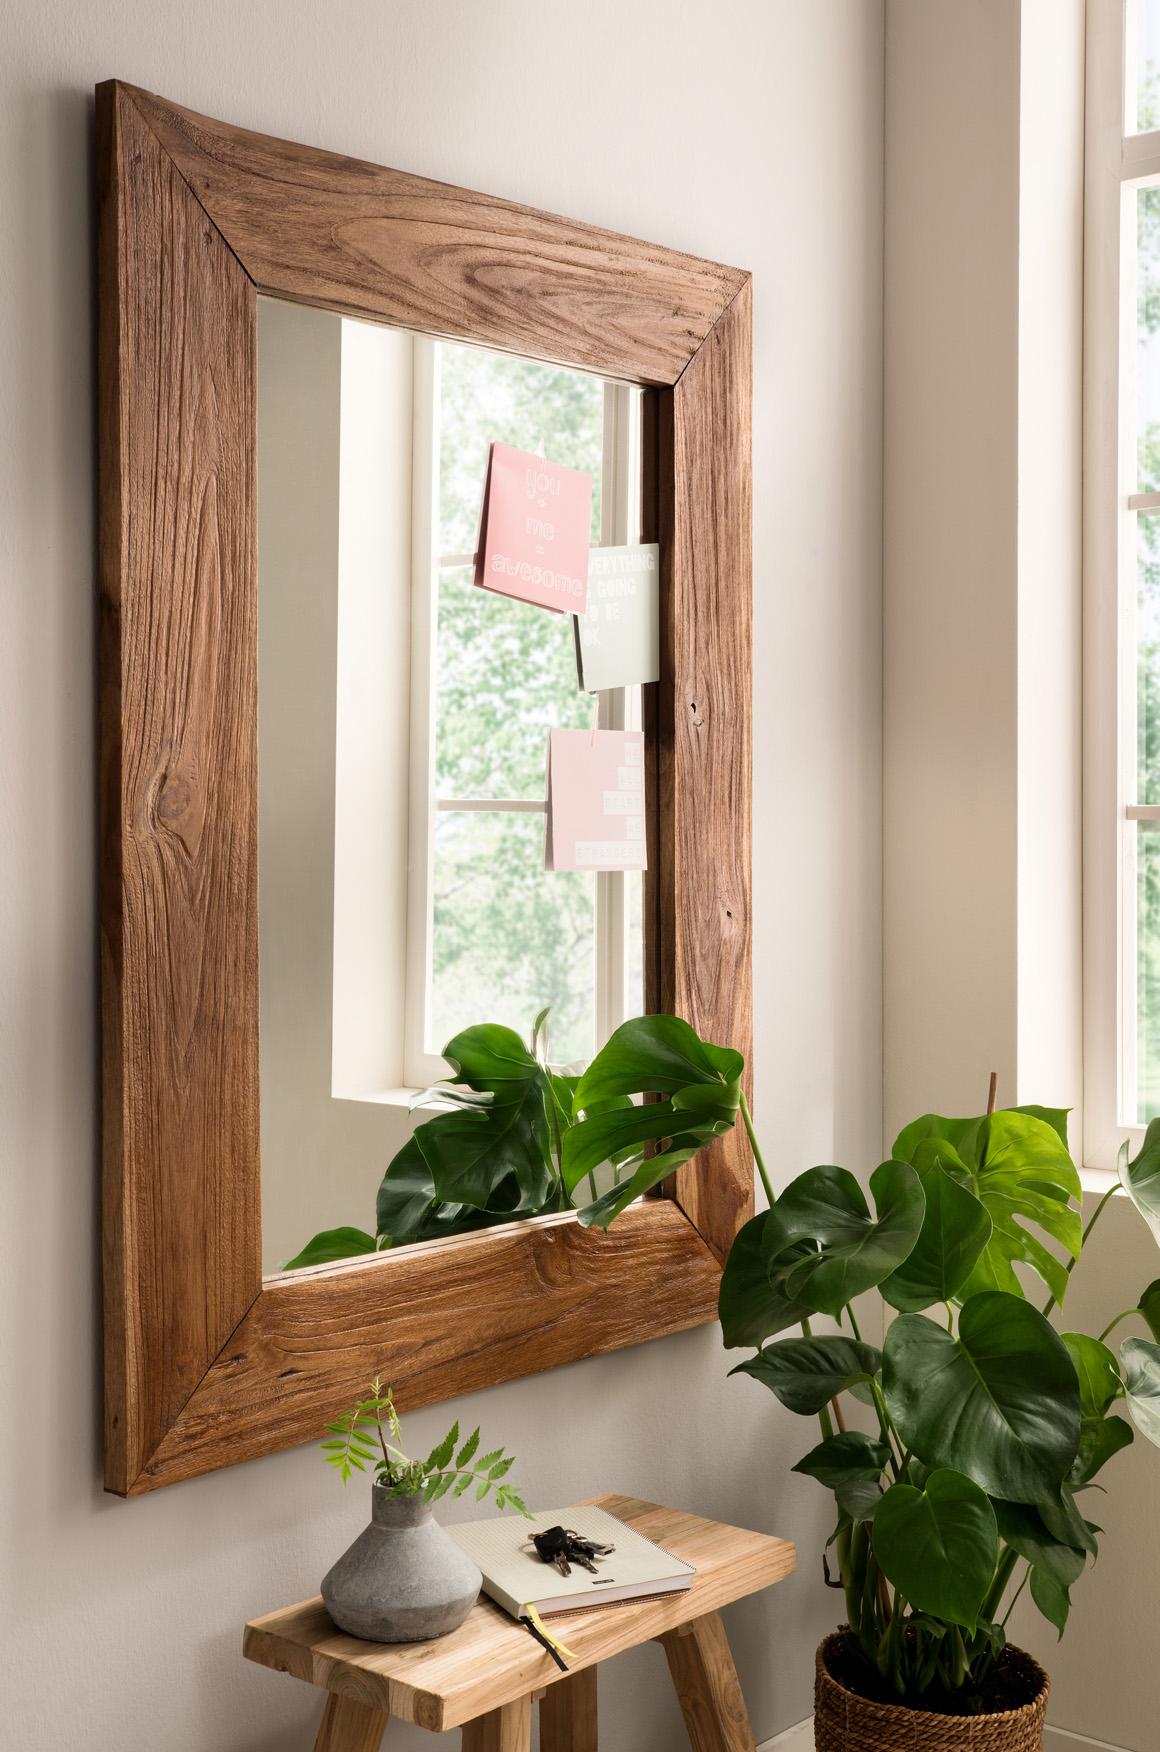 Wandspiegel anteak coole deko for Coole deko